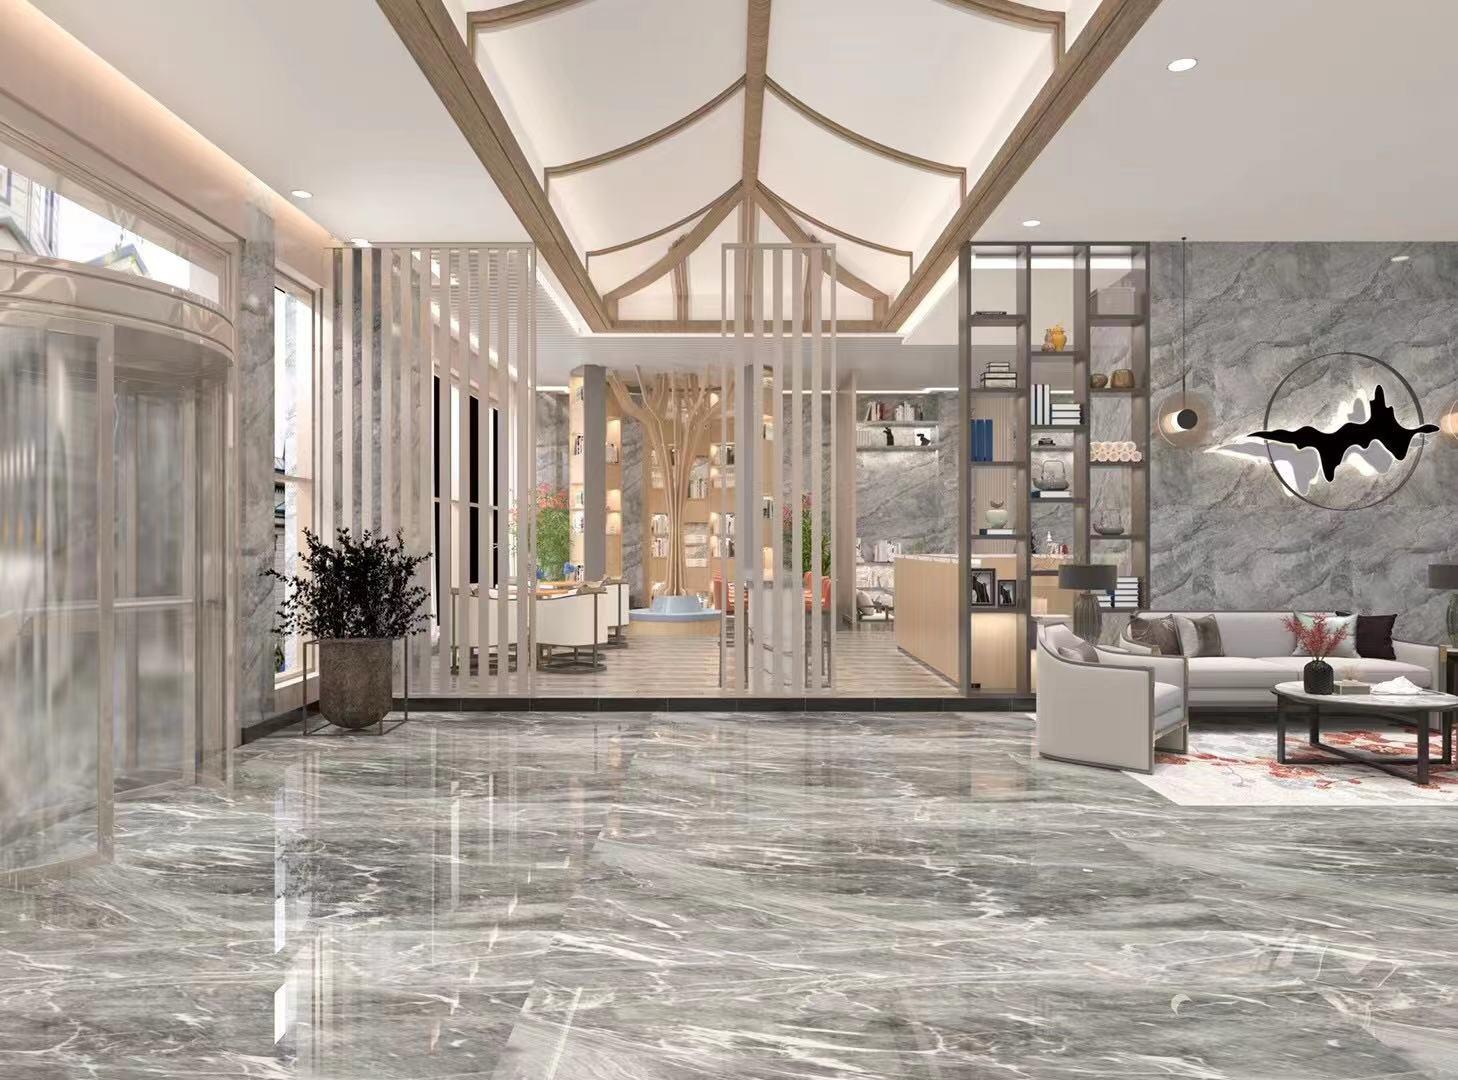 Cucci Grey France Marble For Floor Tiles